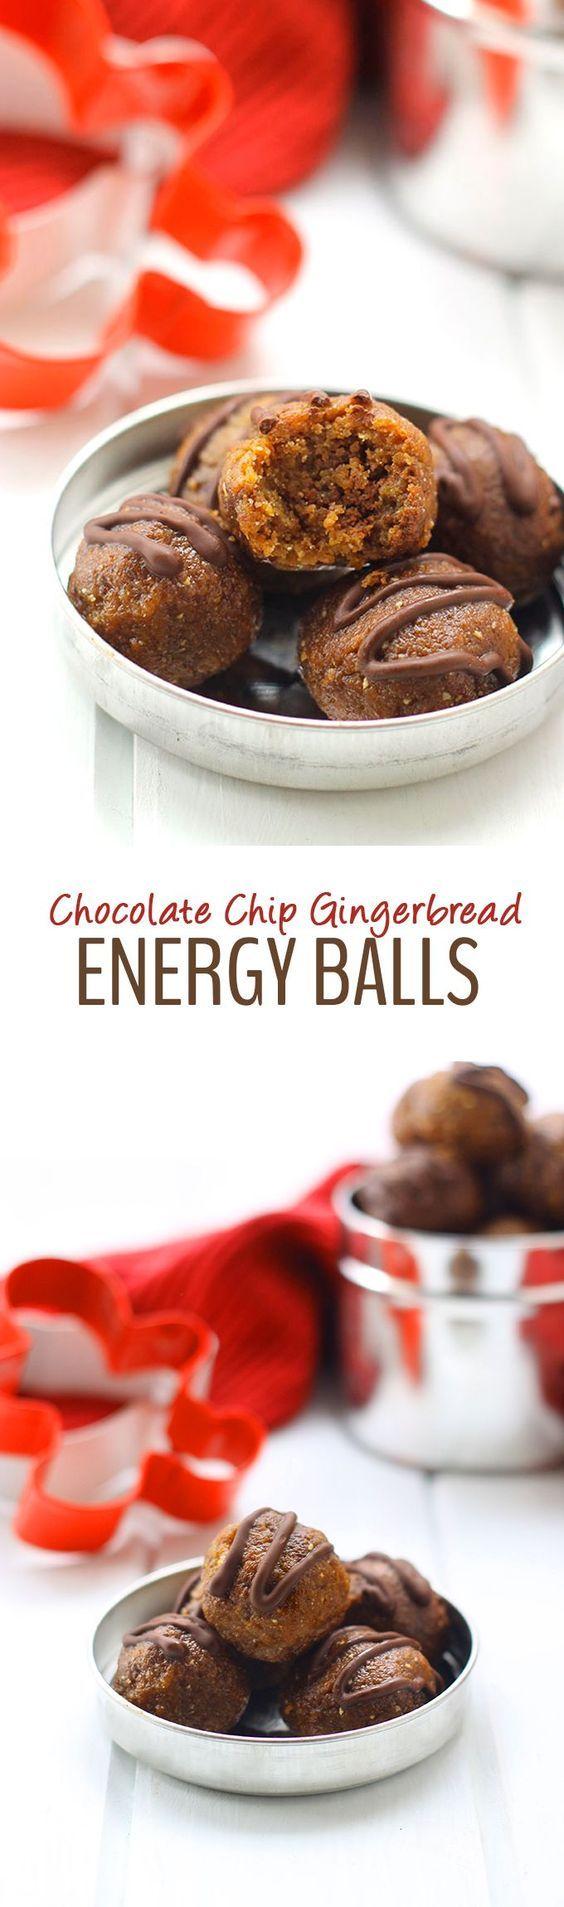 nice Chocolate Chip Gingerbread Energy Balls